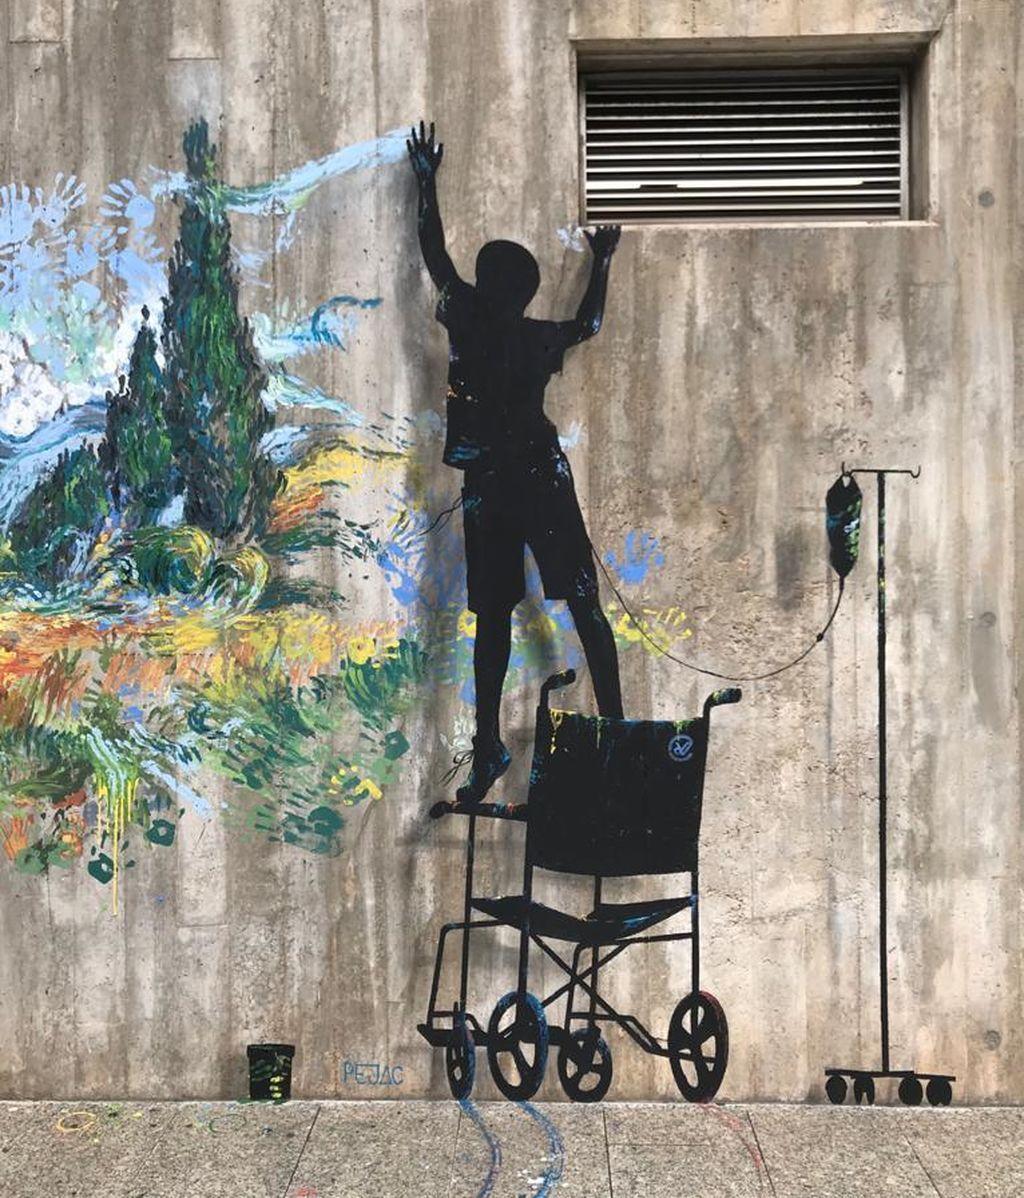 'Superación', mural del artista Pejac en el Hospital Marqués de Valdecilla en Santander